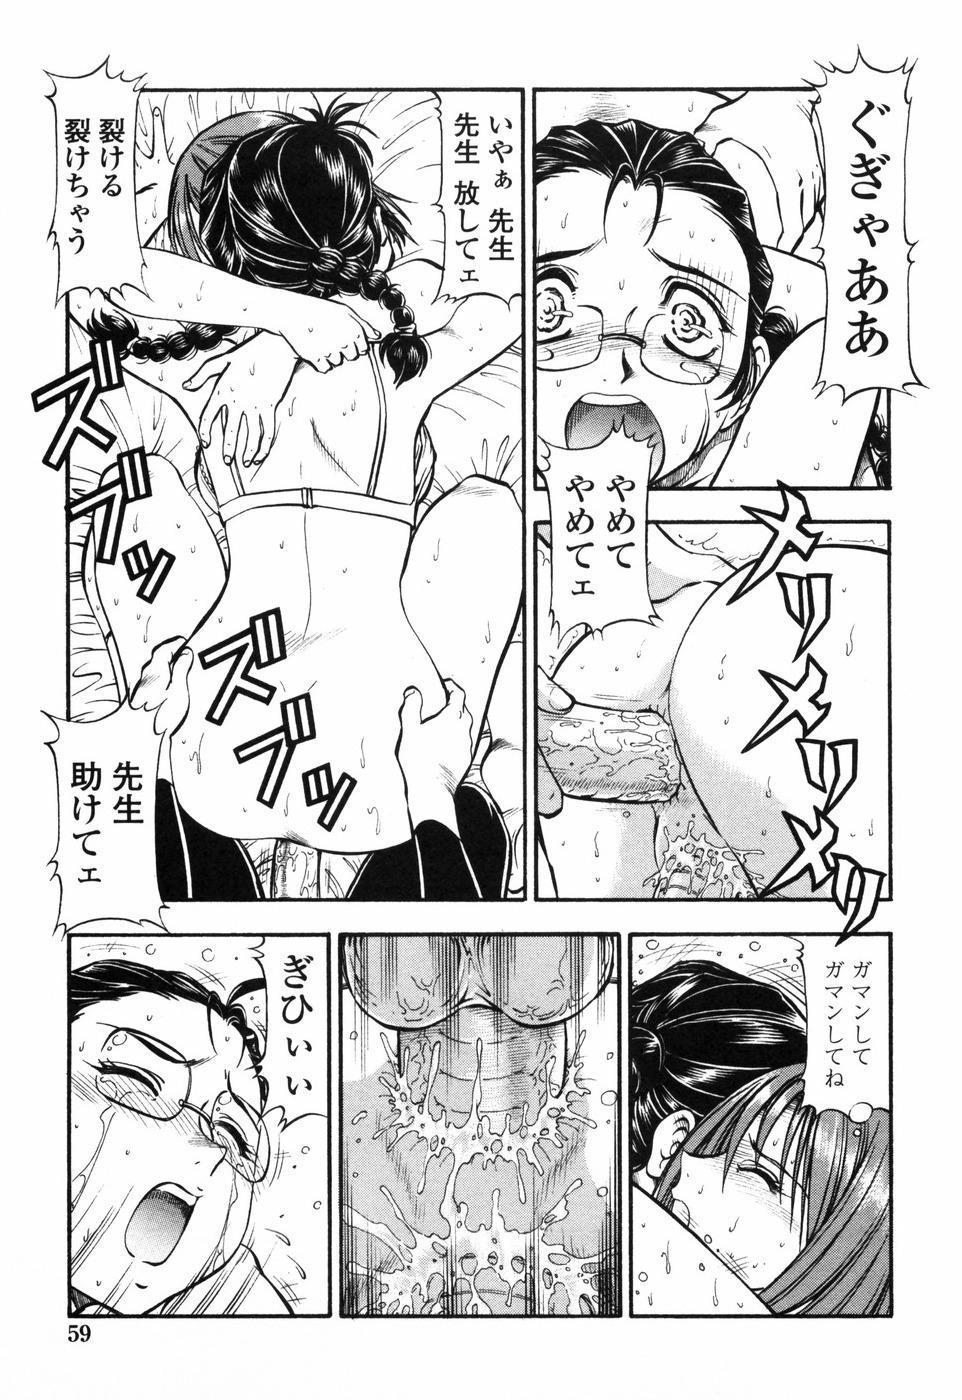 Kichiku Houteishiki - Equation of brutal person 64